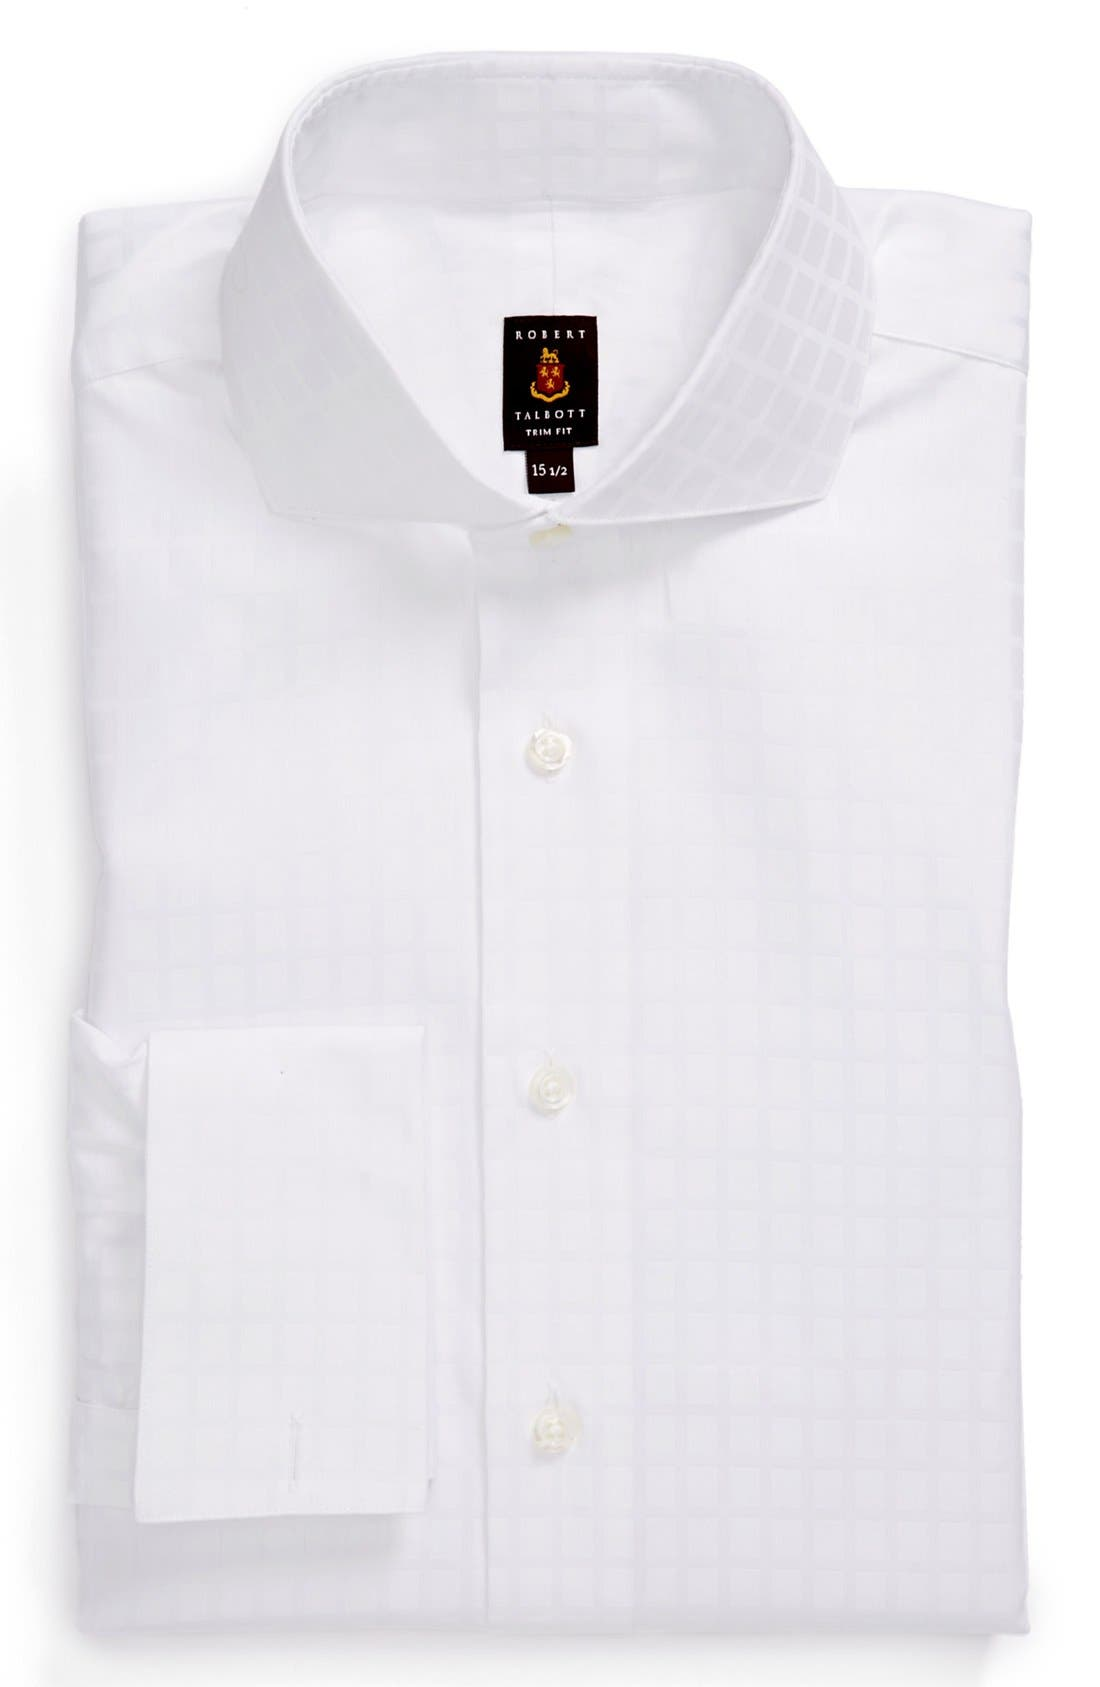 Alternate Image 1 Selected - Robert Talbott Trim Fit Dress Shirt